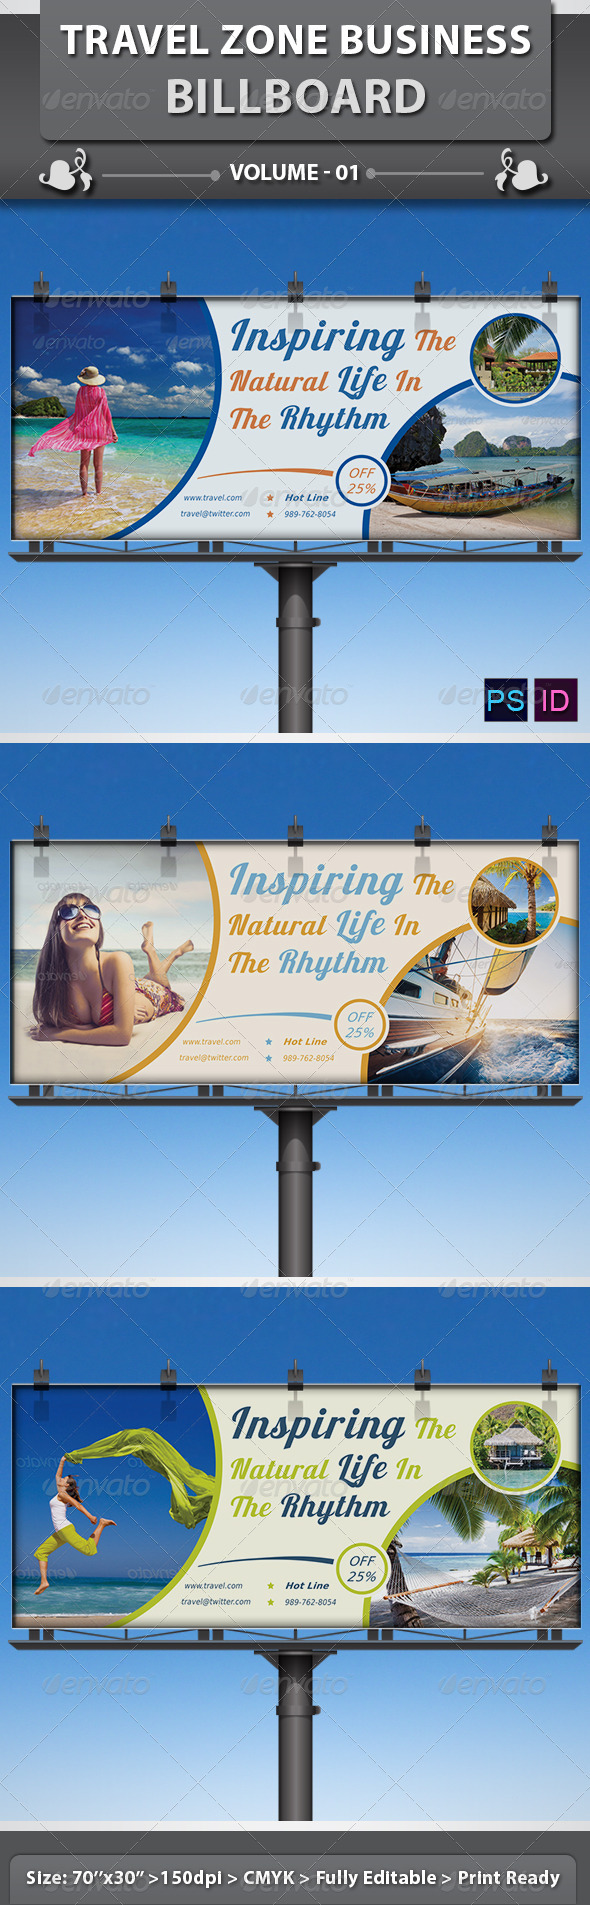 GraphicRiver Travel Zone Business Billboard v1 6420424